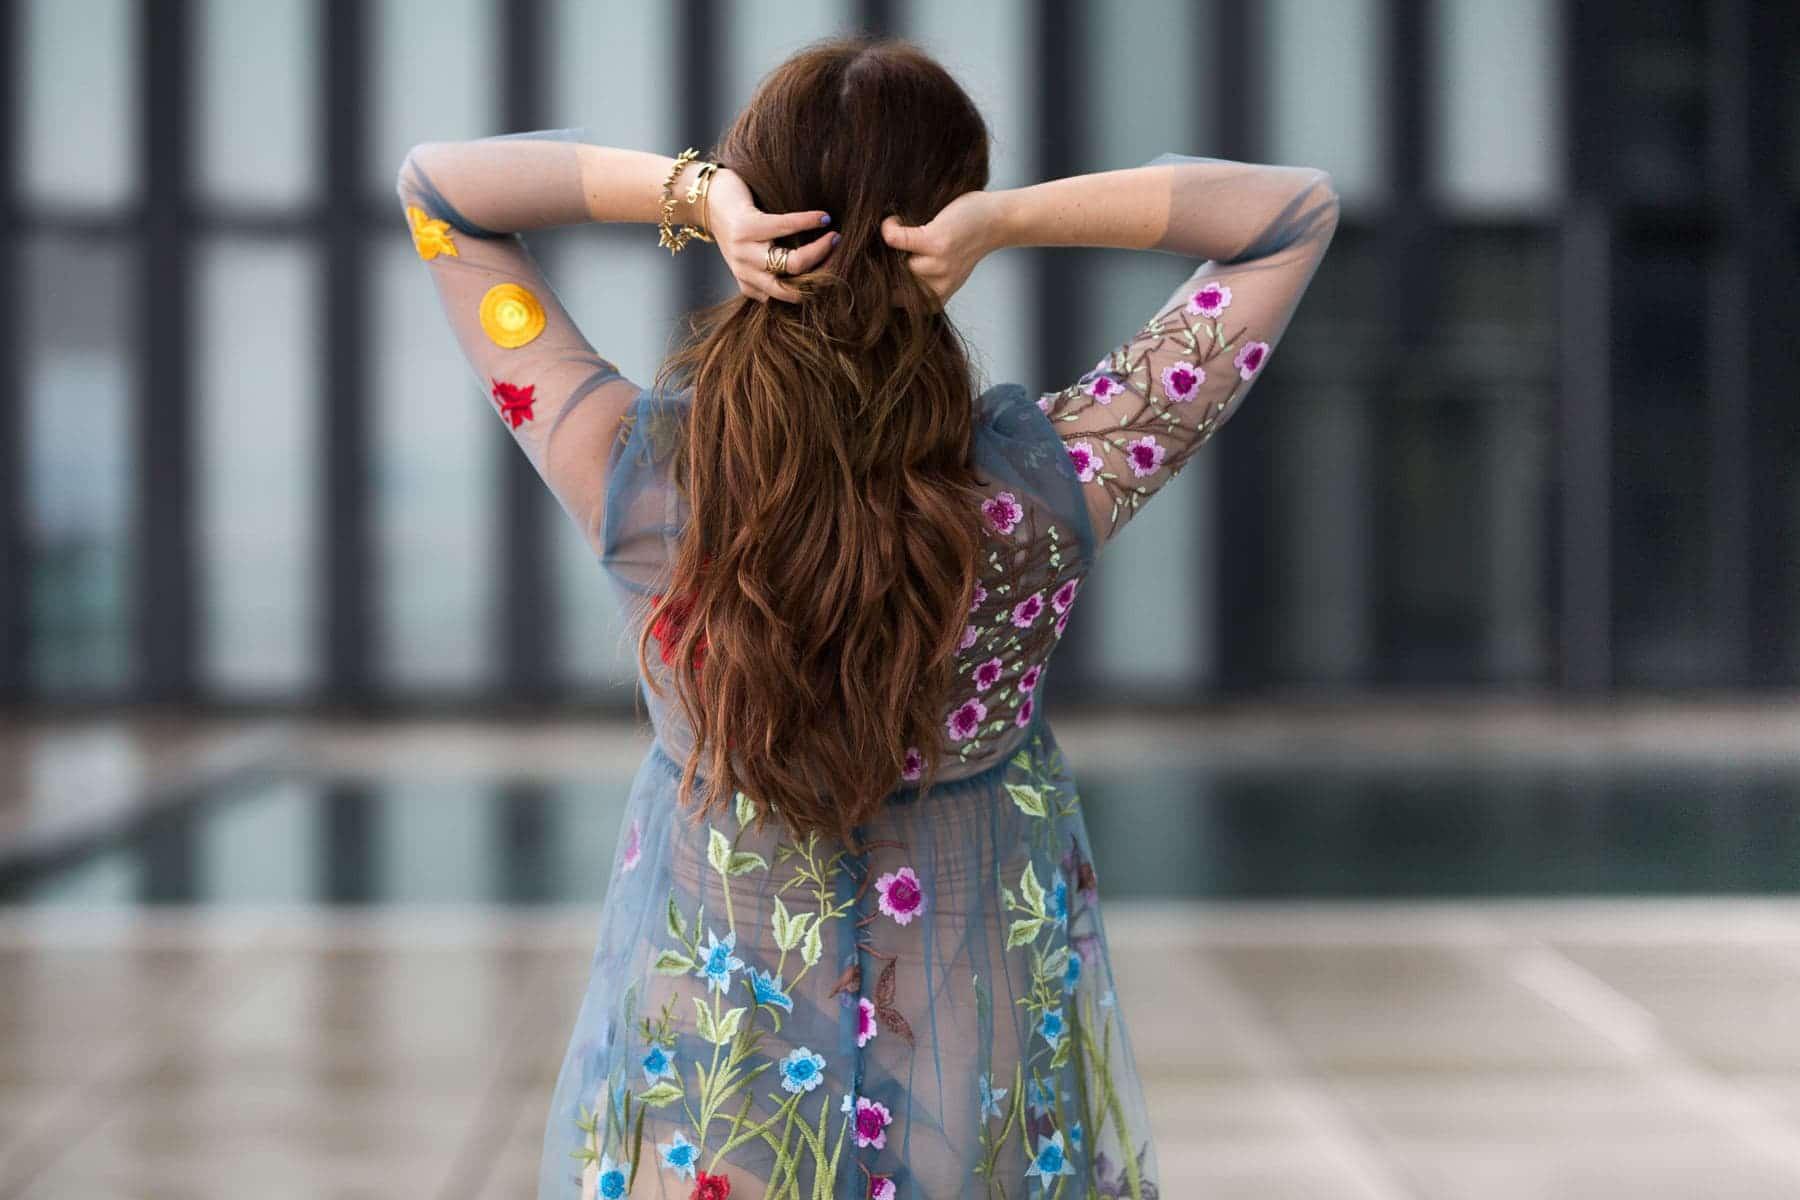 Mein Berlinale Look: Transparentes Kleid mit Blumenprint & Chloé Faye